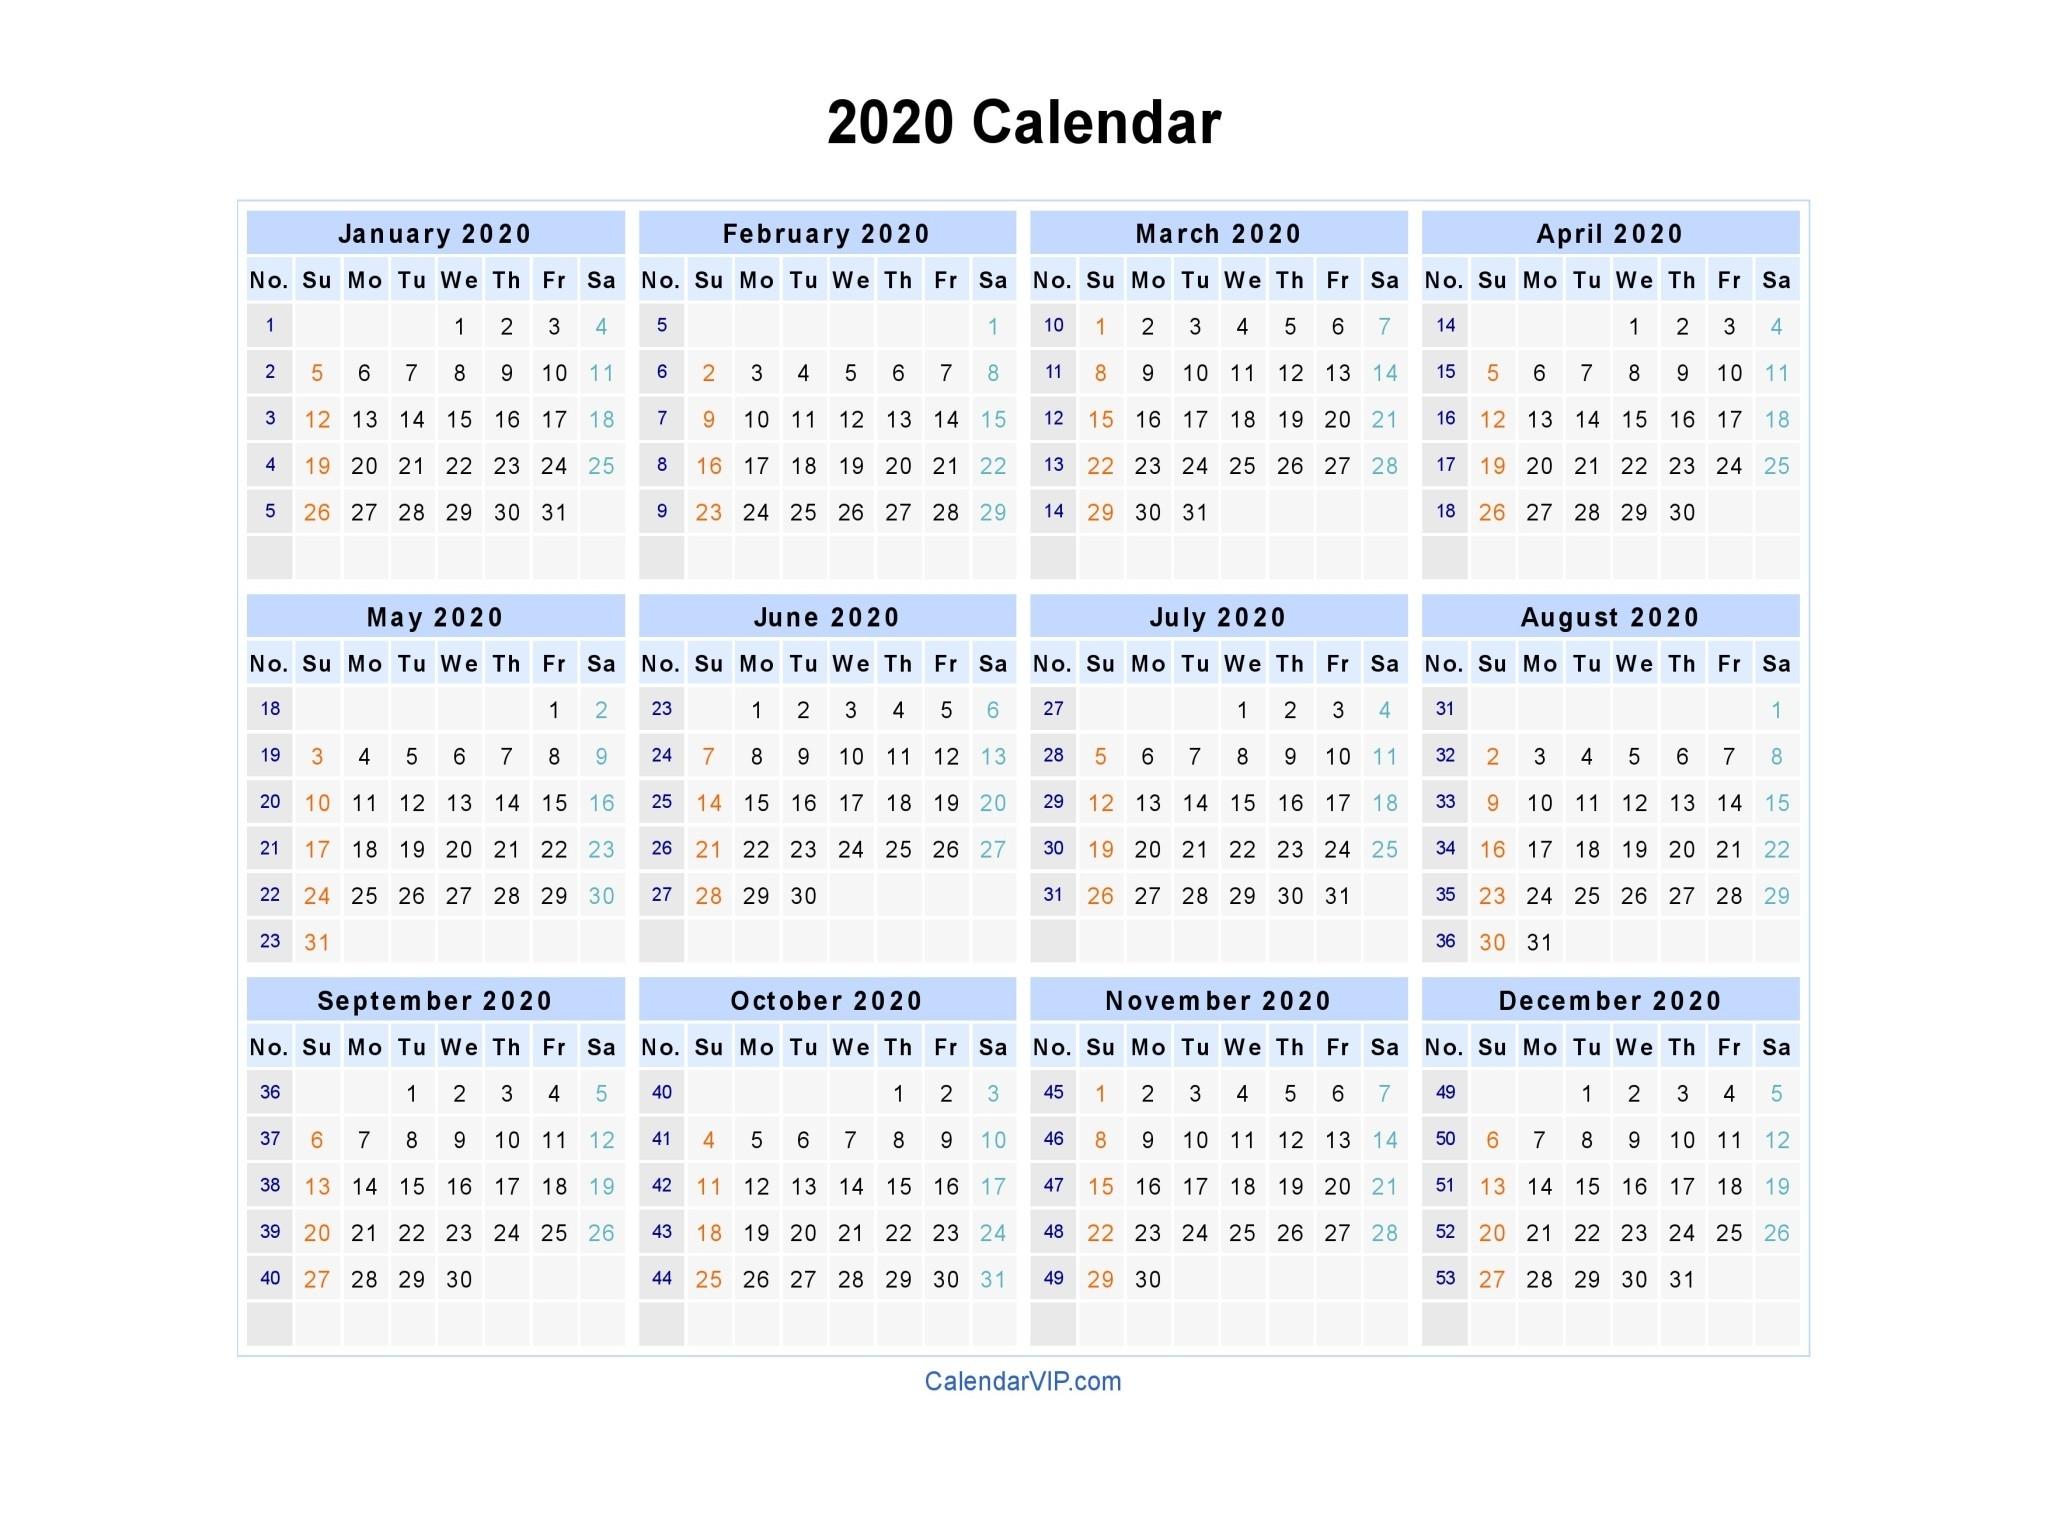 2020 Calendar - Blank Printable Calendar Template In Pdf  A3 Calendar 2020